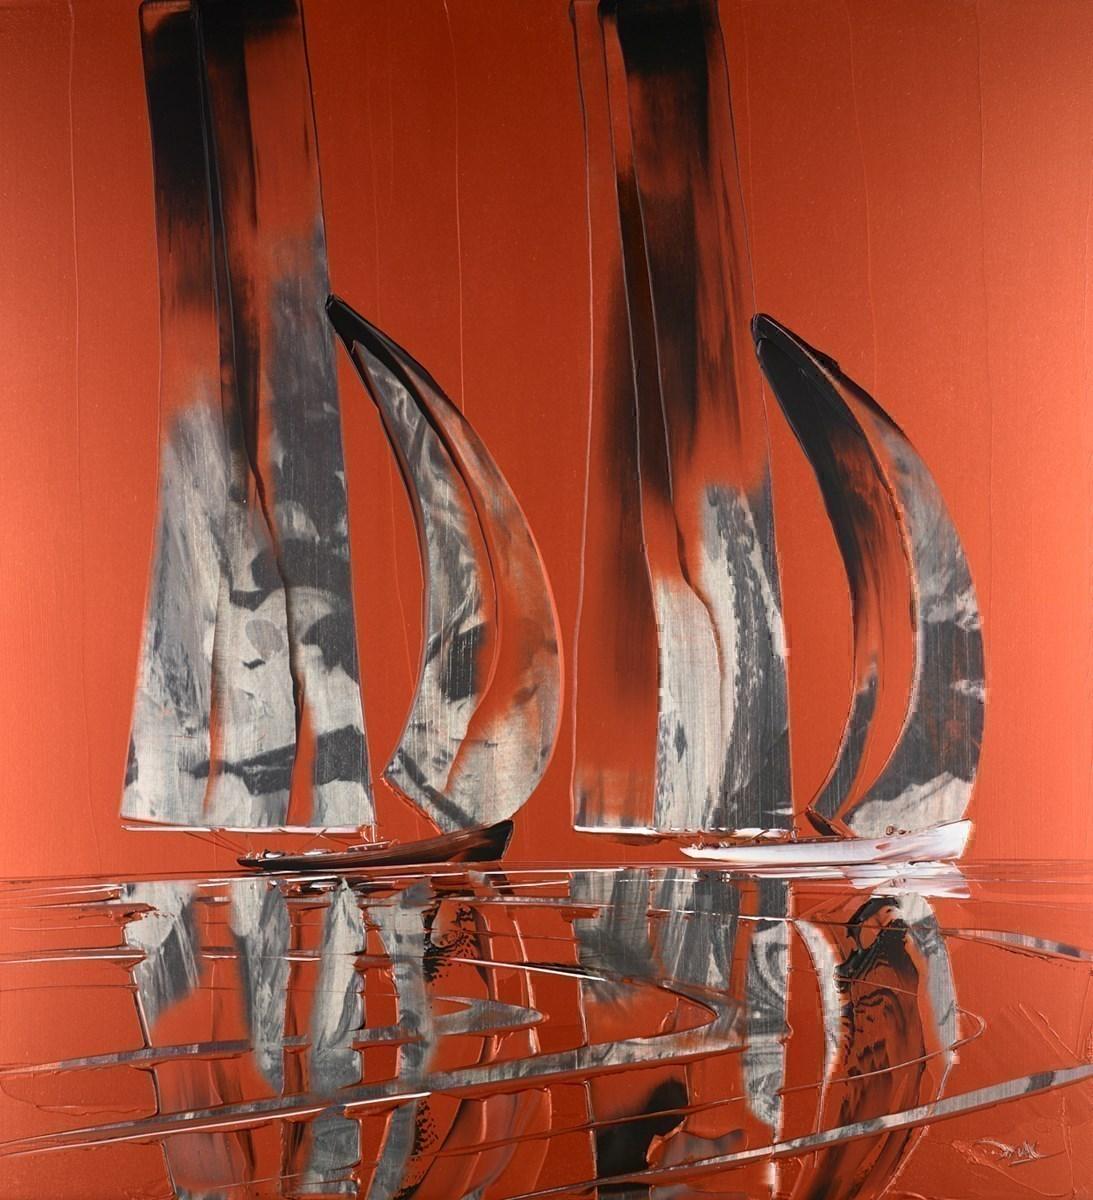 Copper Sails